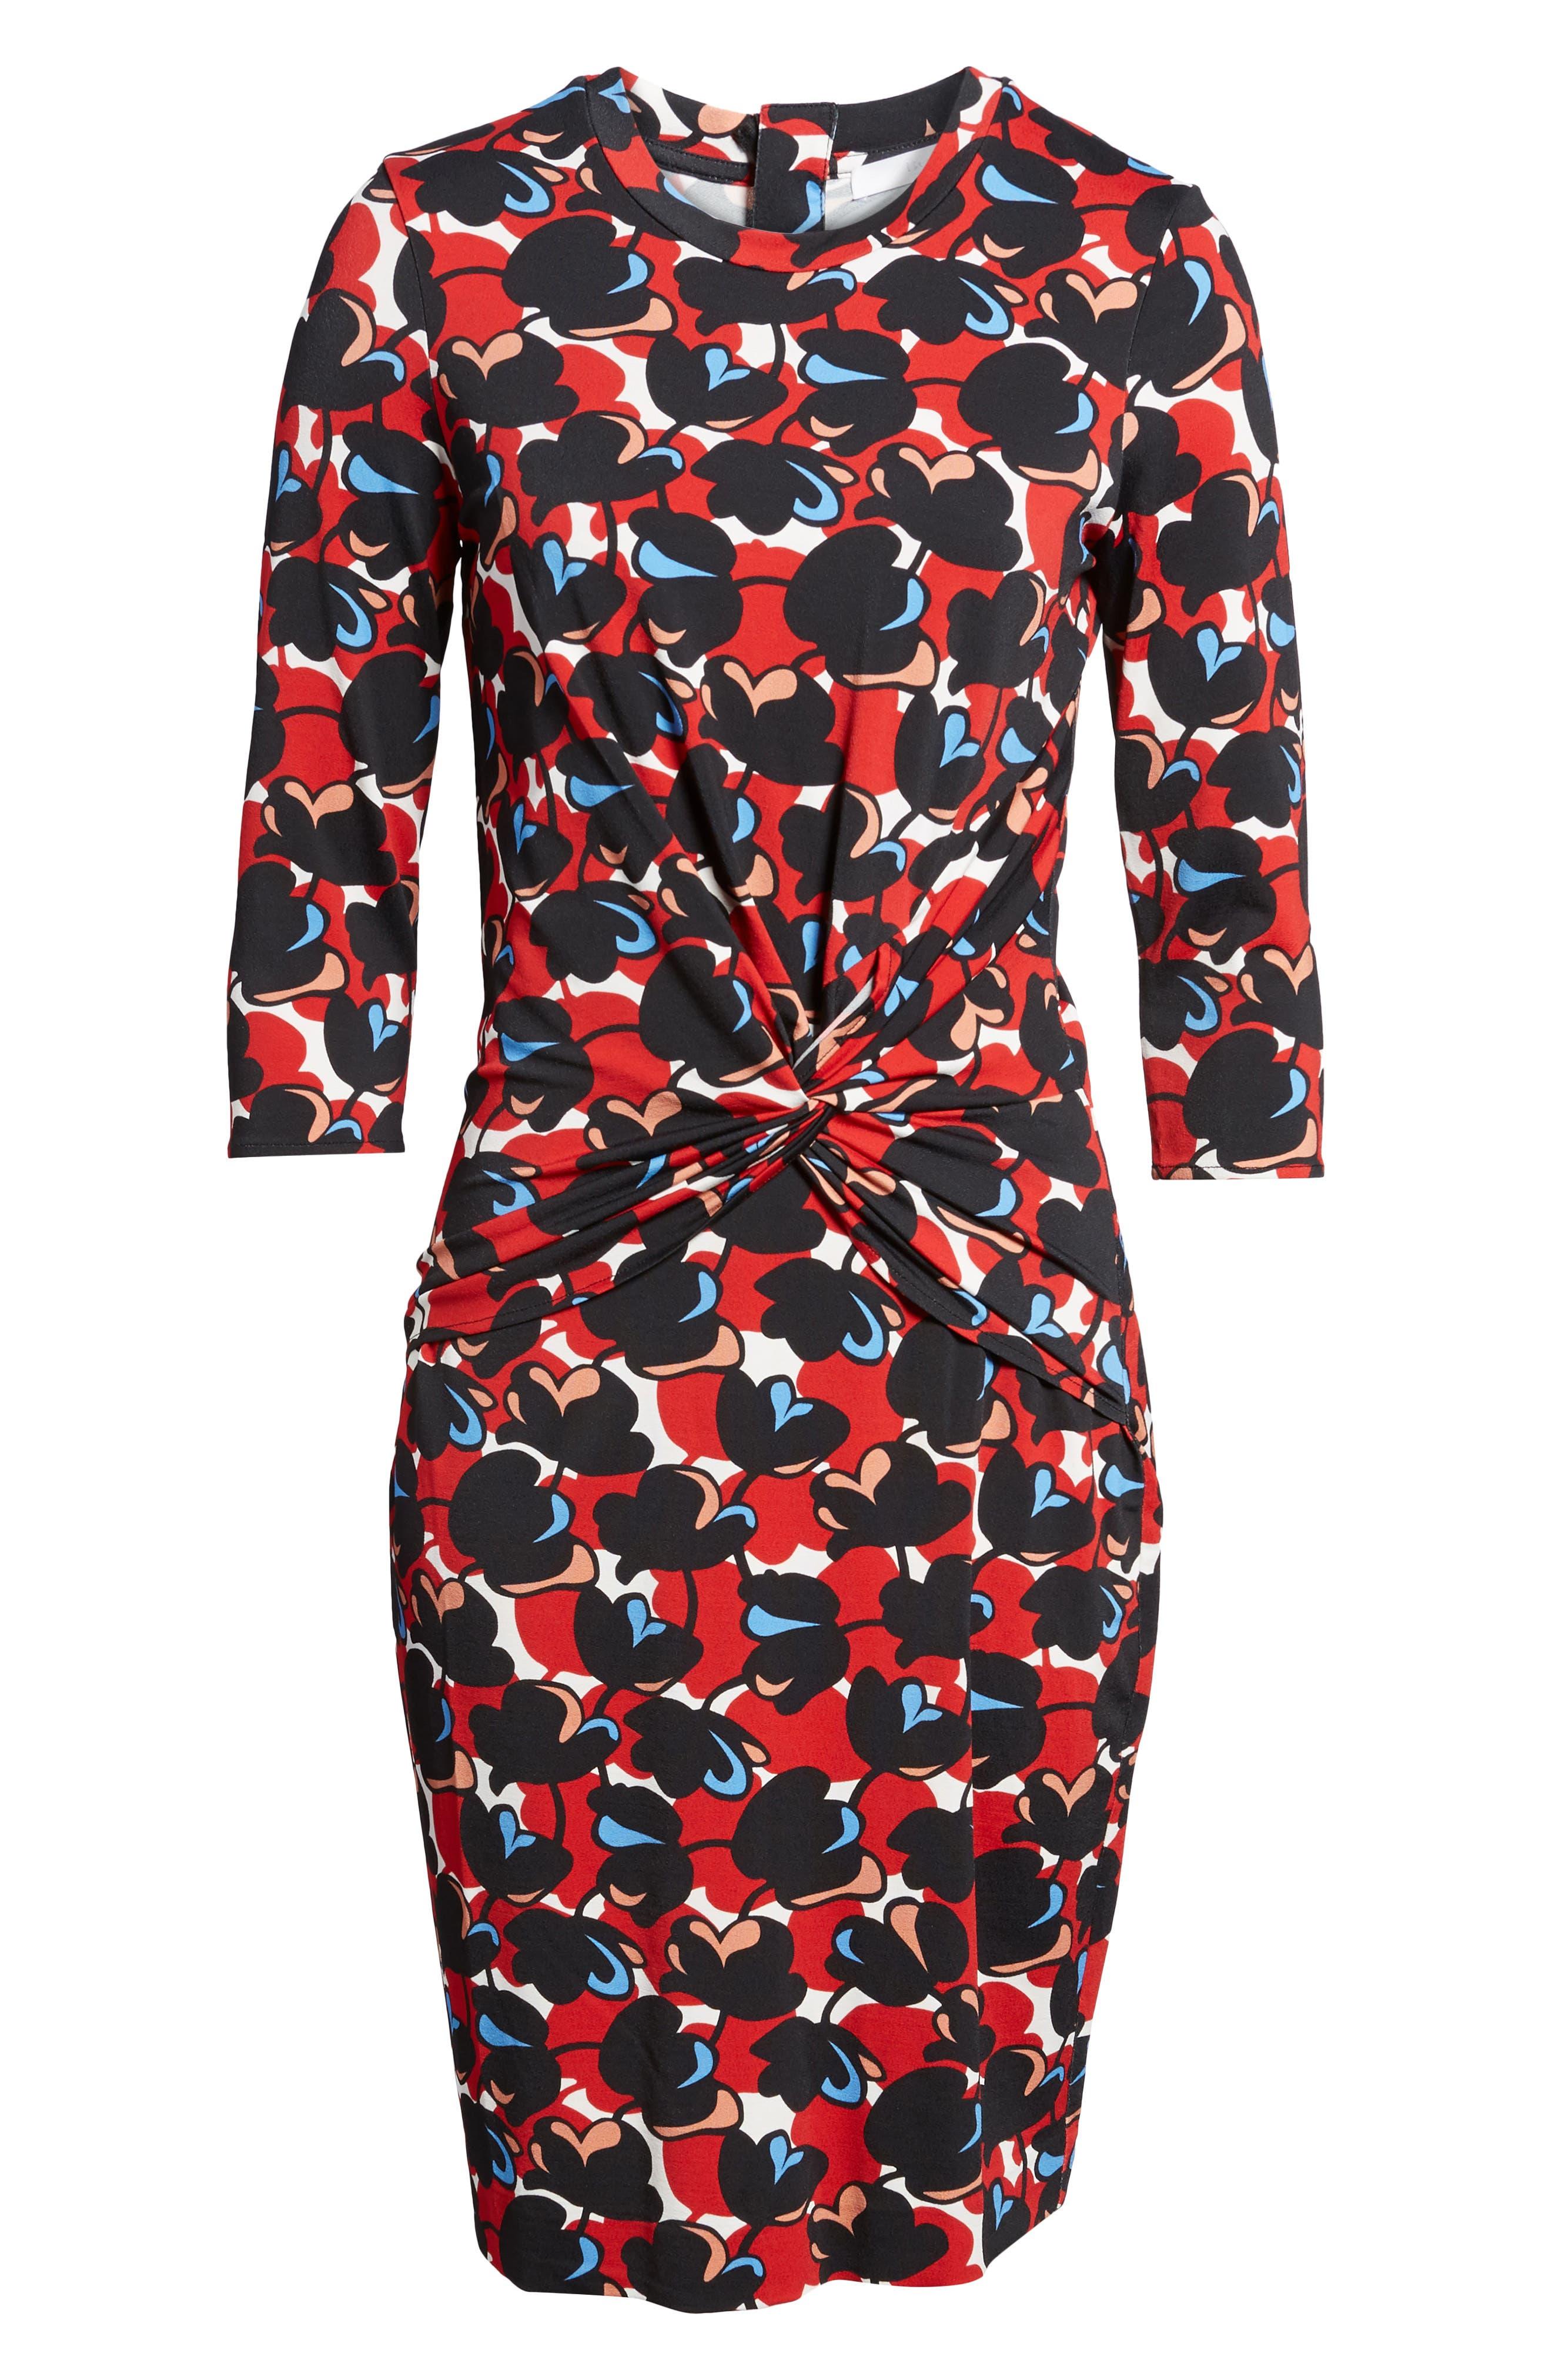 Eleika Print Jersey Sheath Dress,                             Alternate thumbnail 6, color,                             Multicolor Flower Print